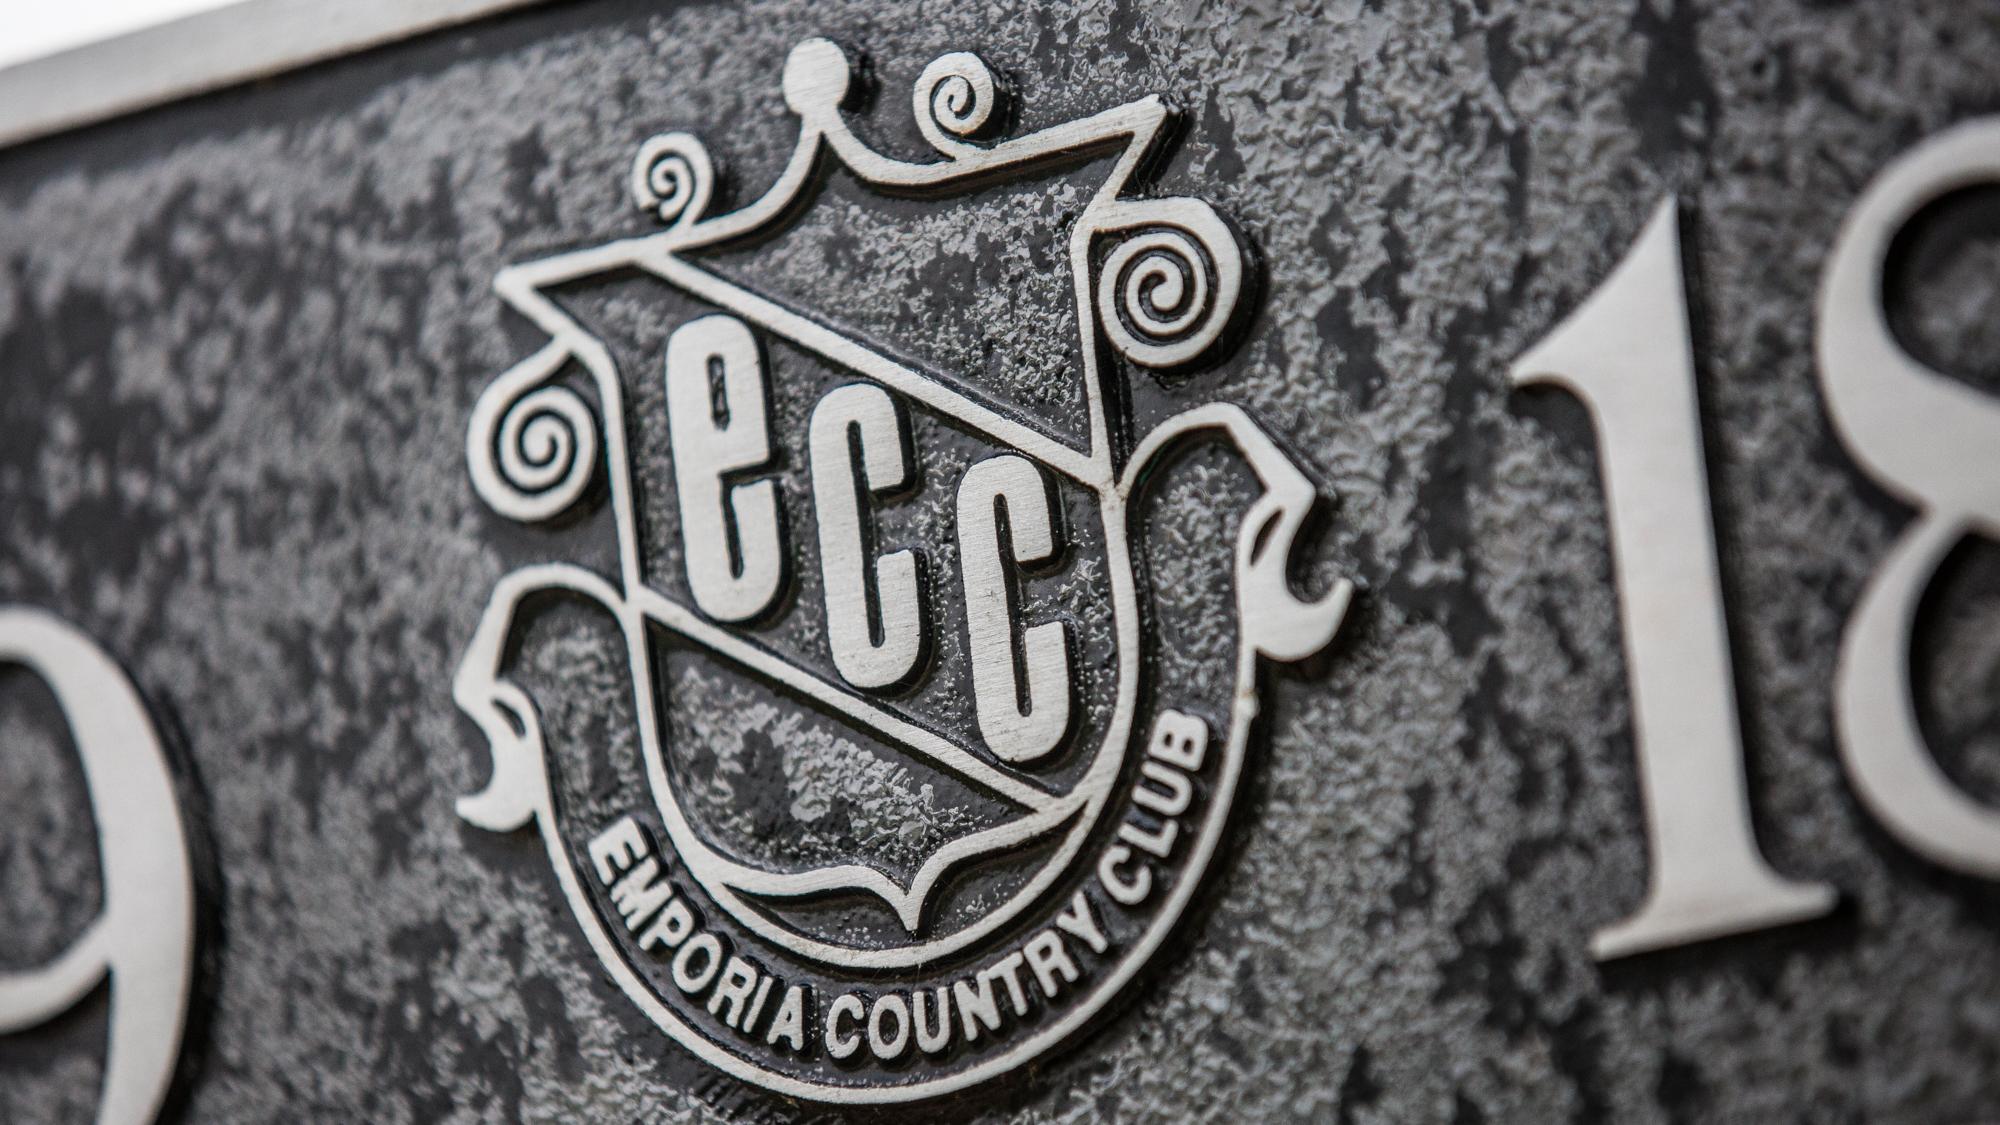 Emporia Country Club Dynamic Discs Glass Blown Open Disc Golf Tournament